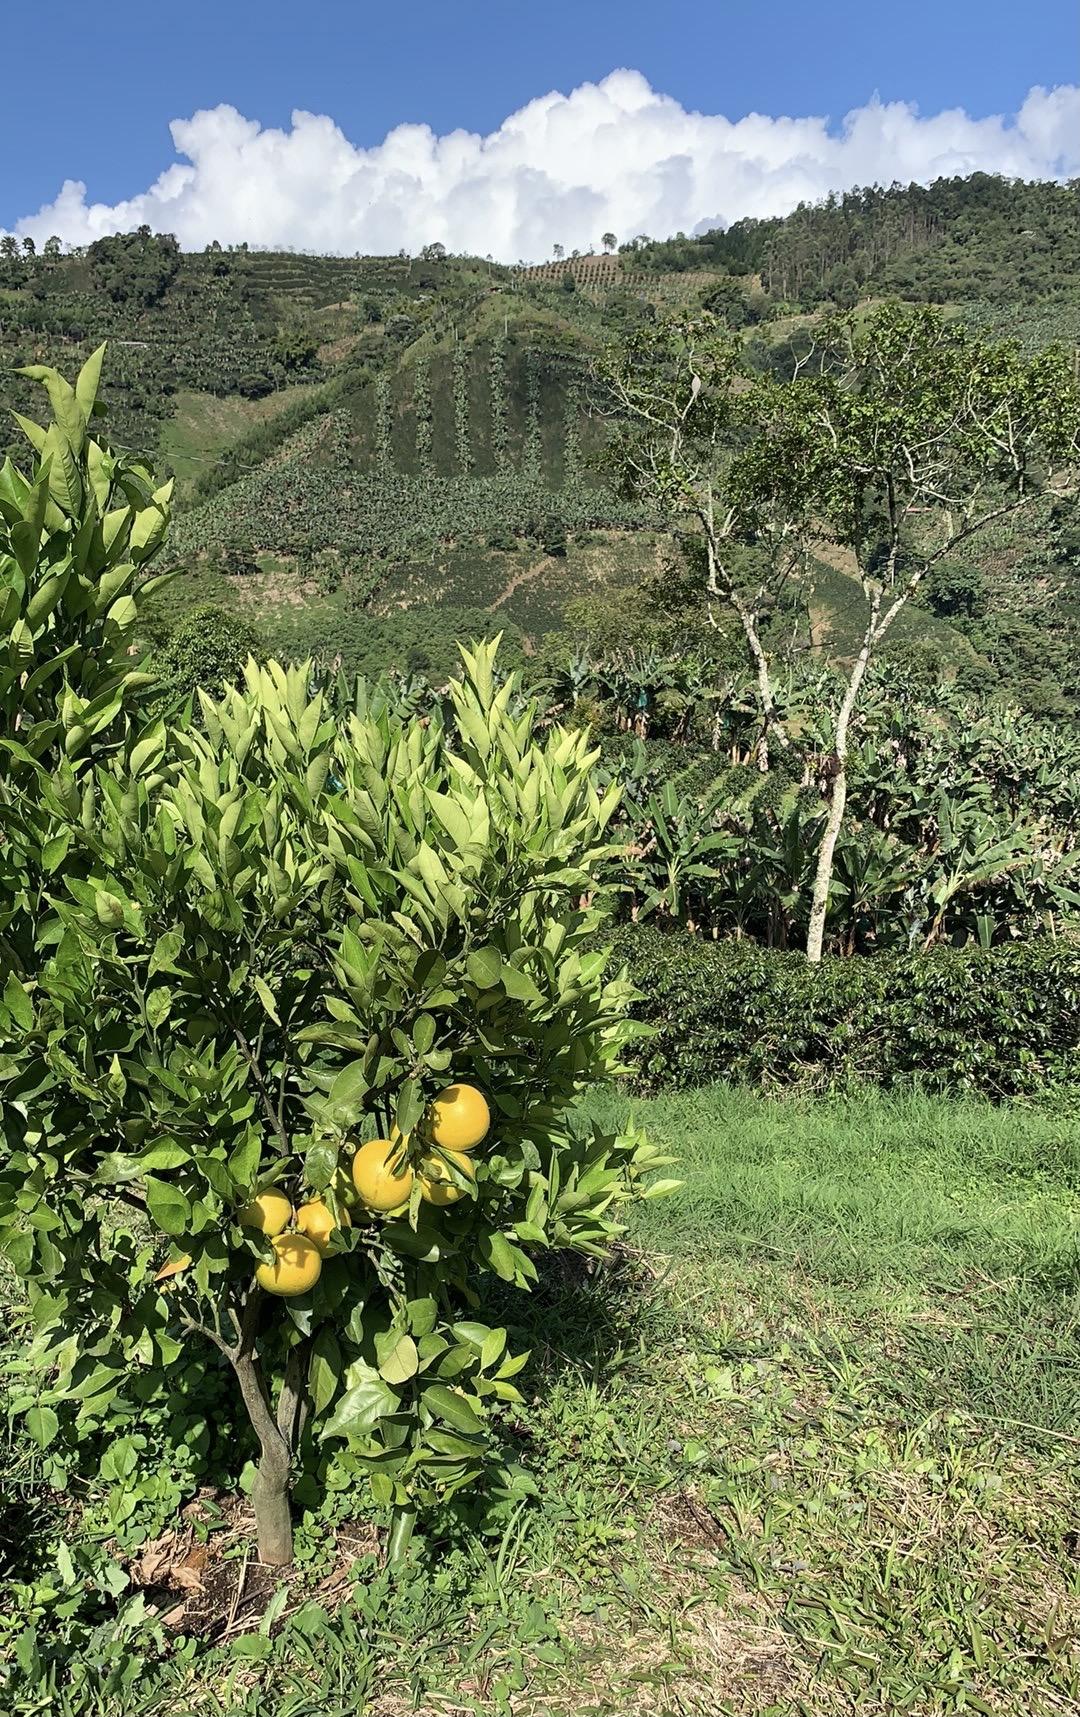 Finca Mariposa Jardin fruits